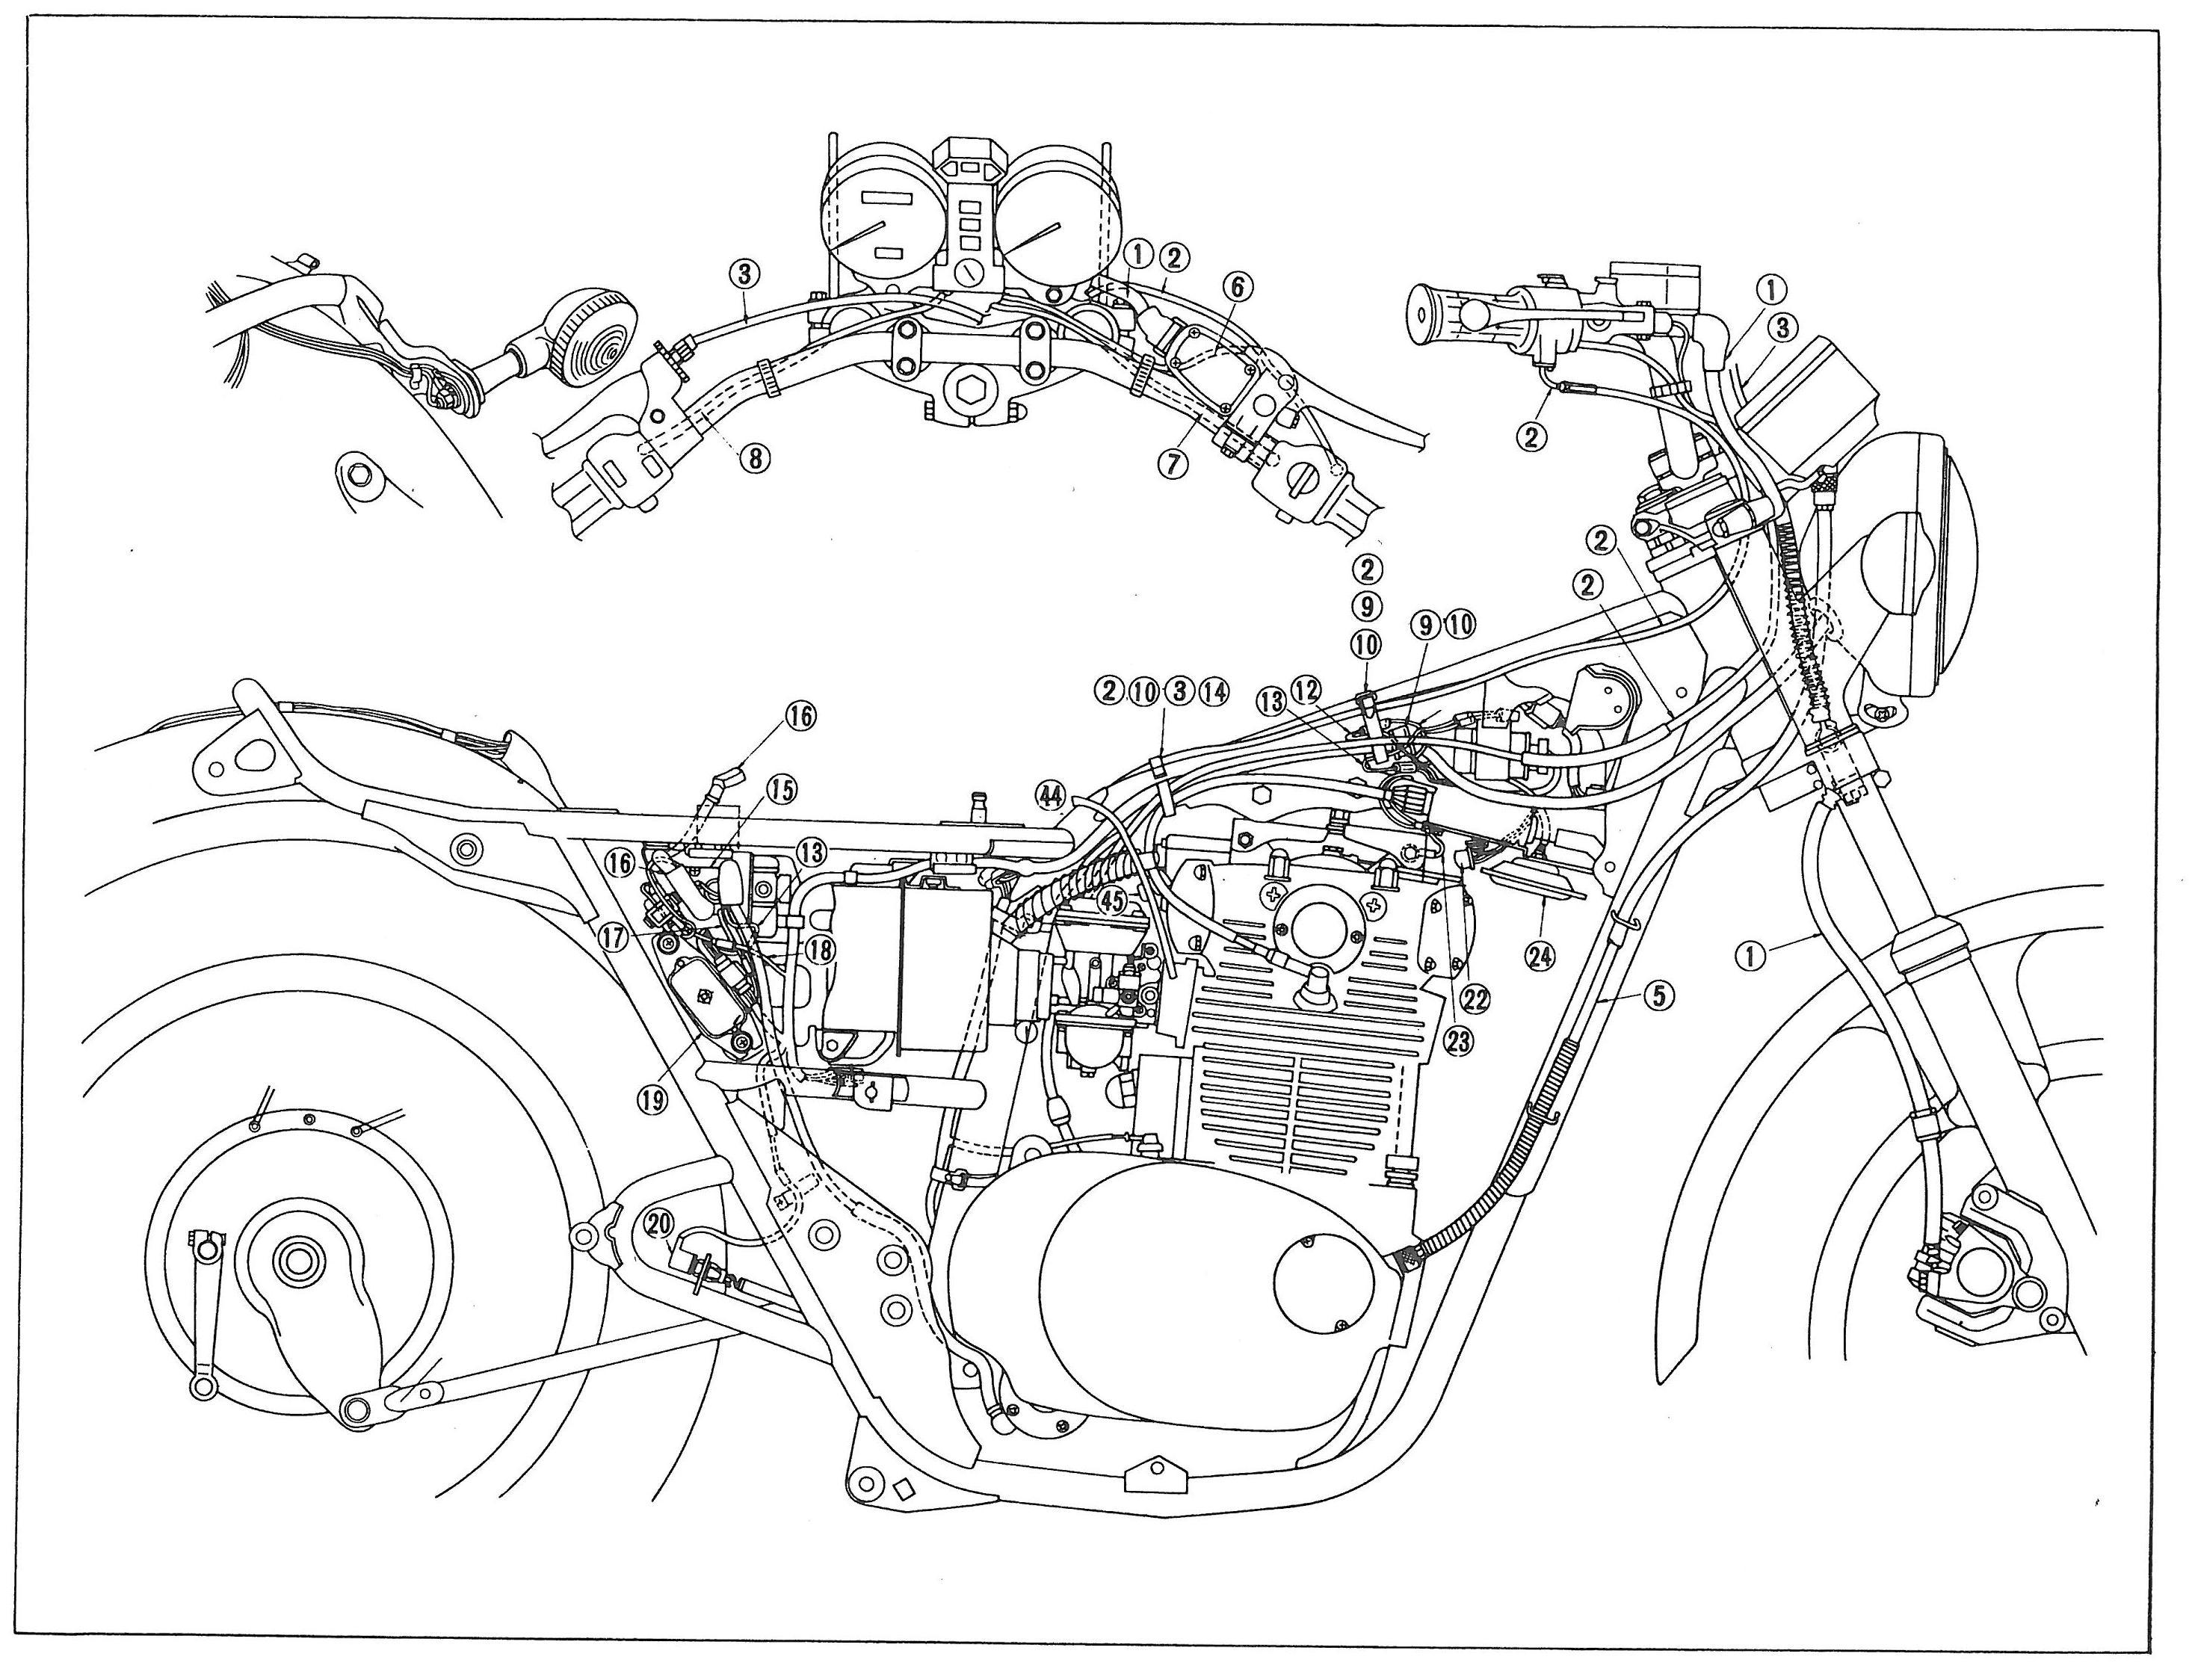 medium resolution of xs650 engine diagram wiring diagram toolbox 1981 xs650 engine diagram